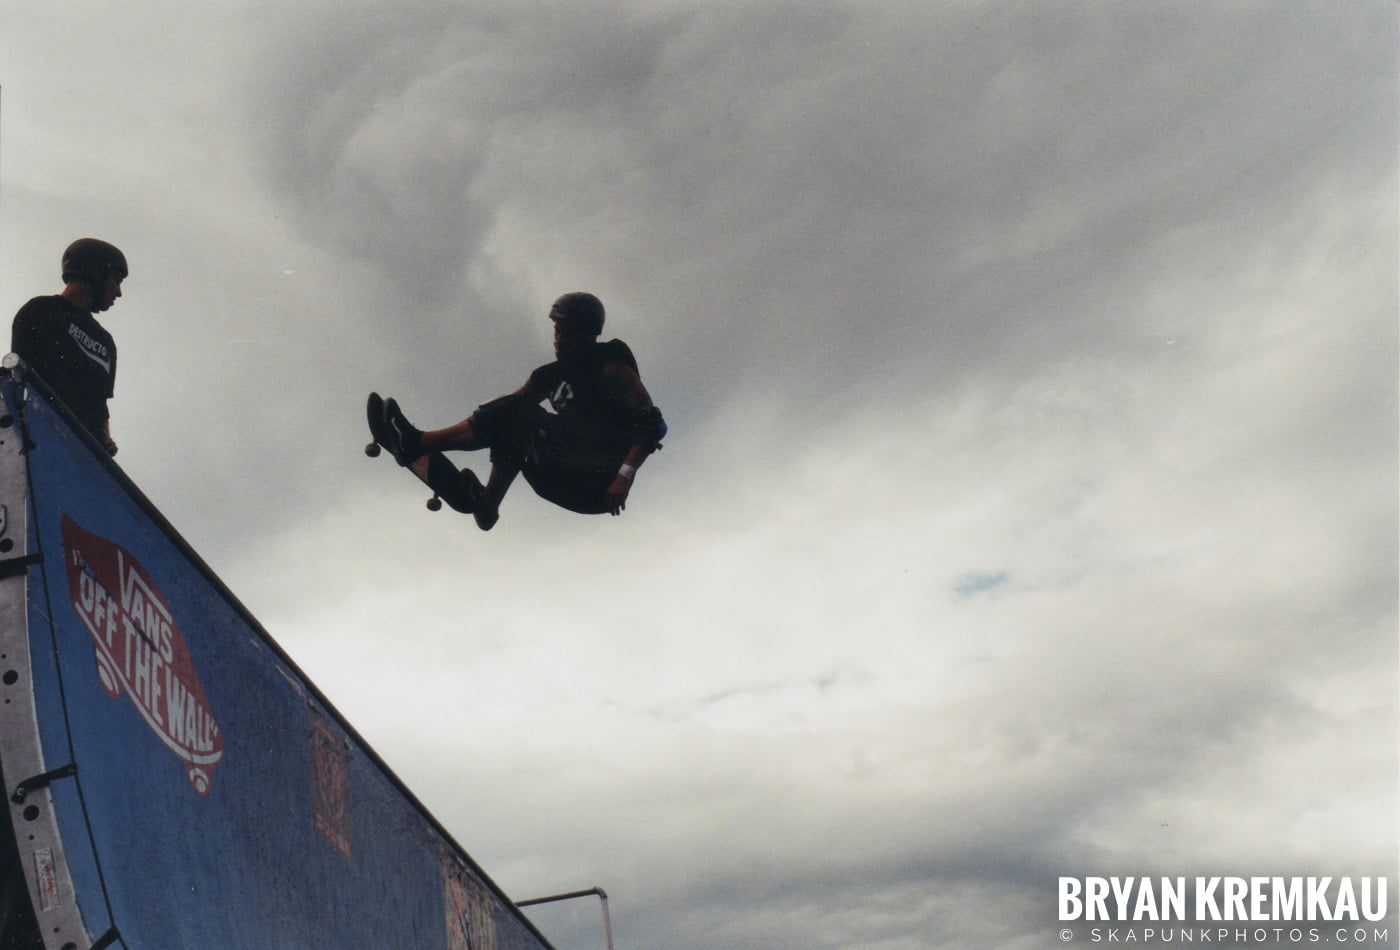 Skaters @ Vans Warped Tour, Randall's Island, NYC - 8.7.04 (1)